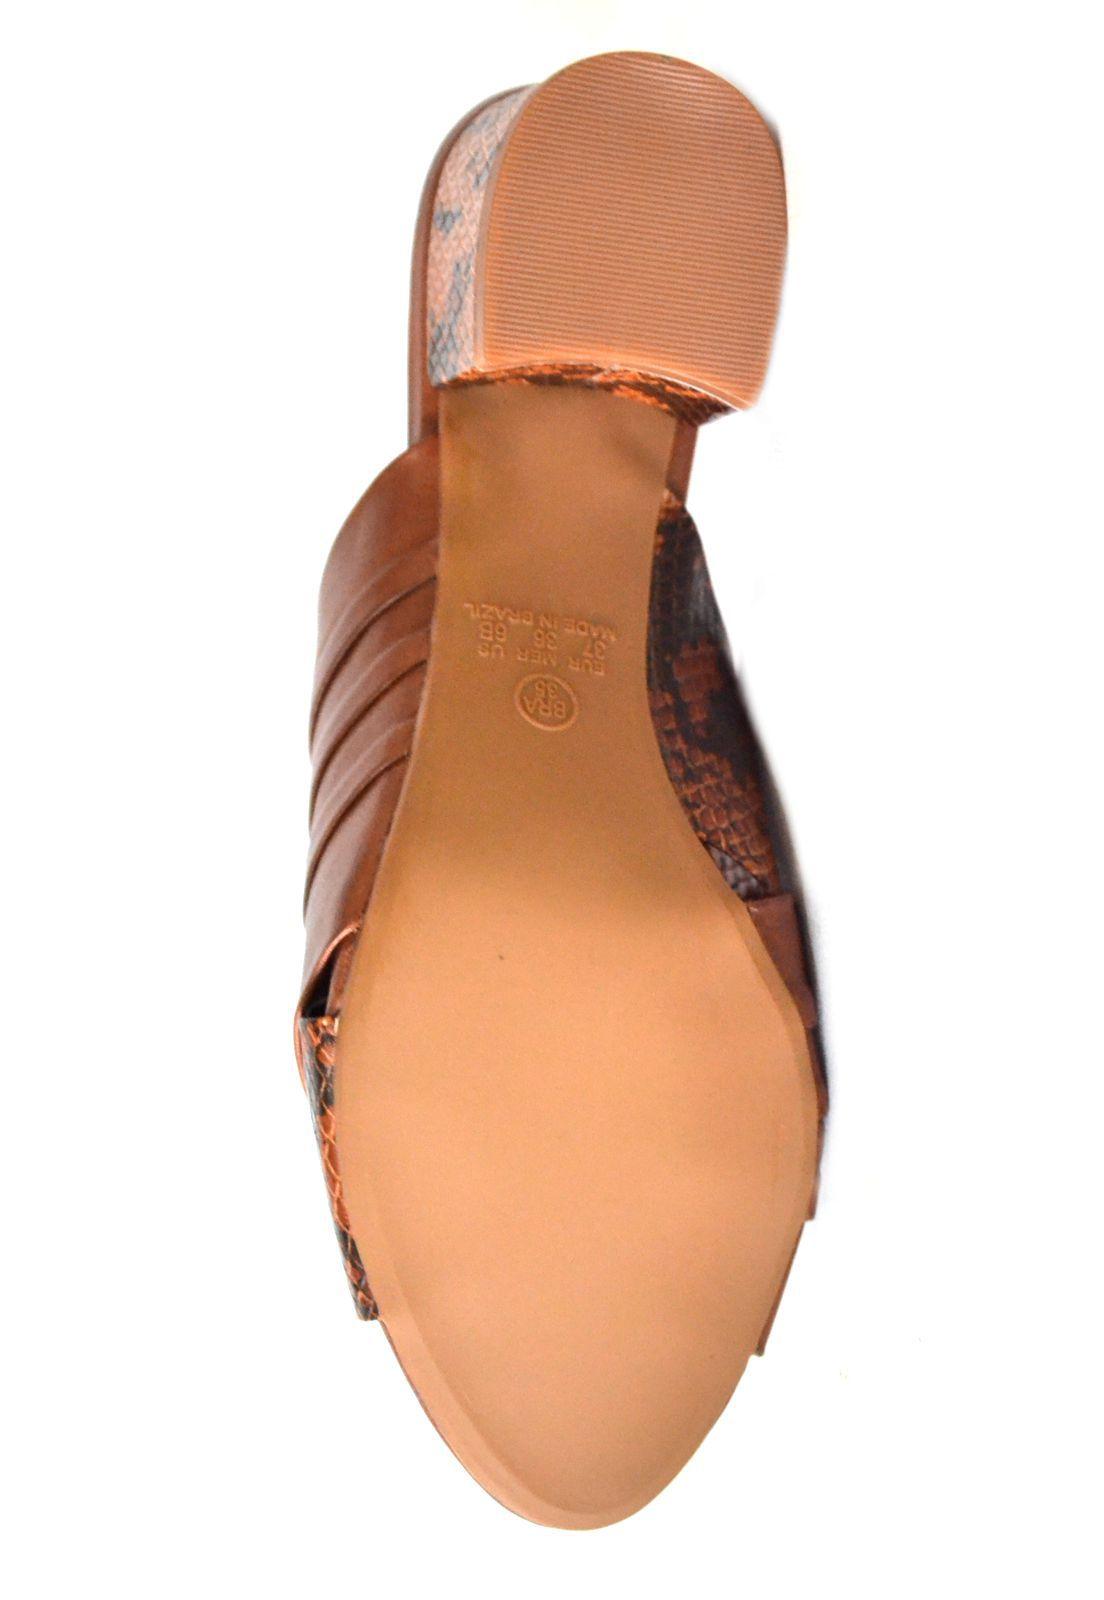 Sandália/Tamanco Feminino Prata Couro  de Salto 1009932 Whisky